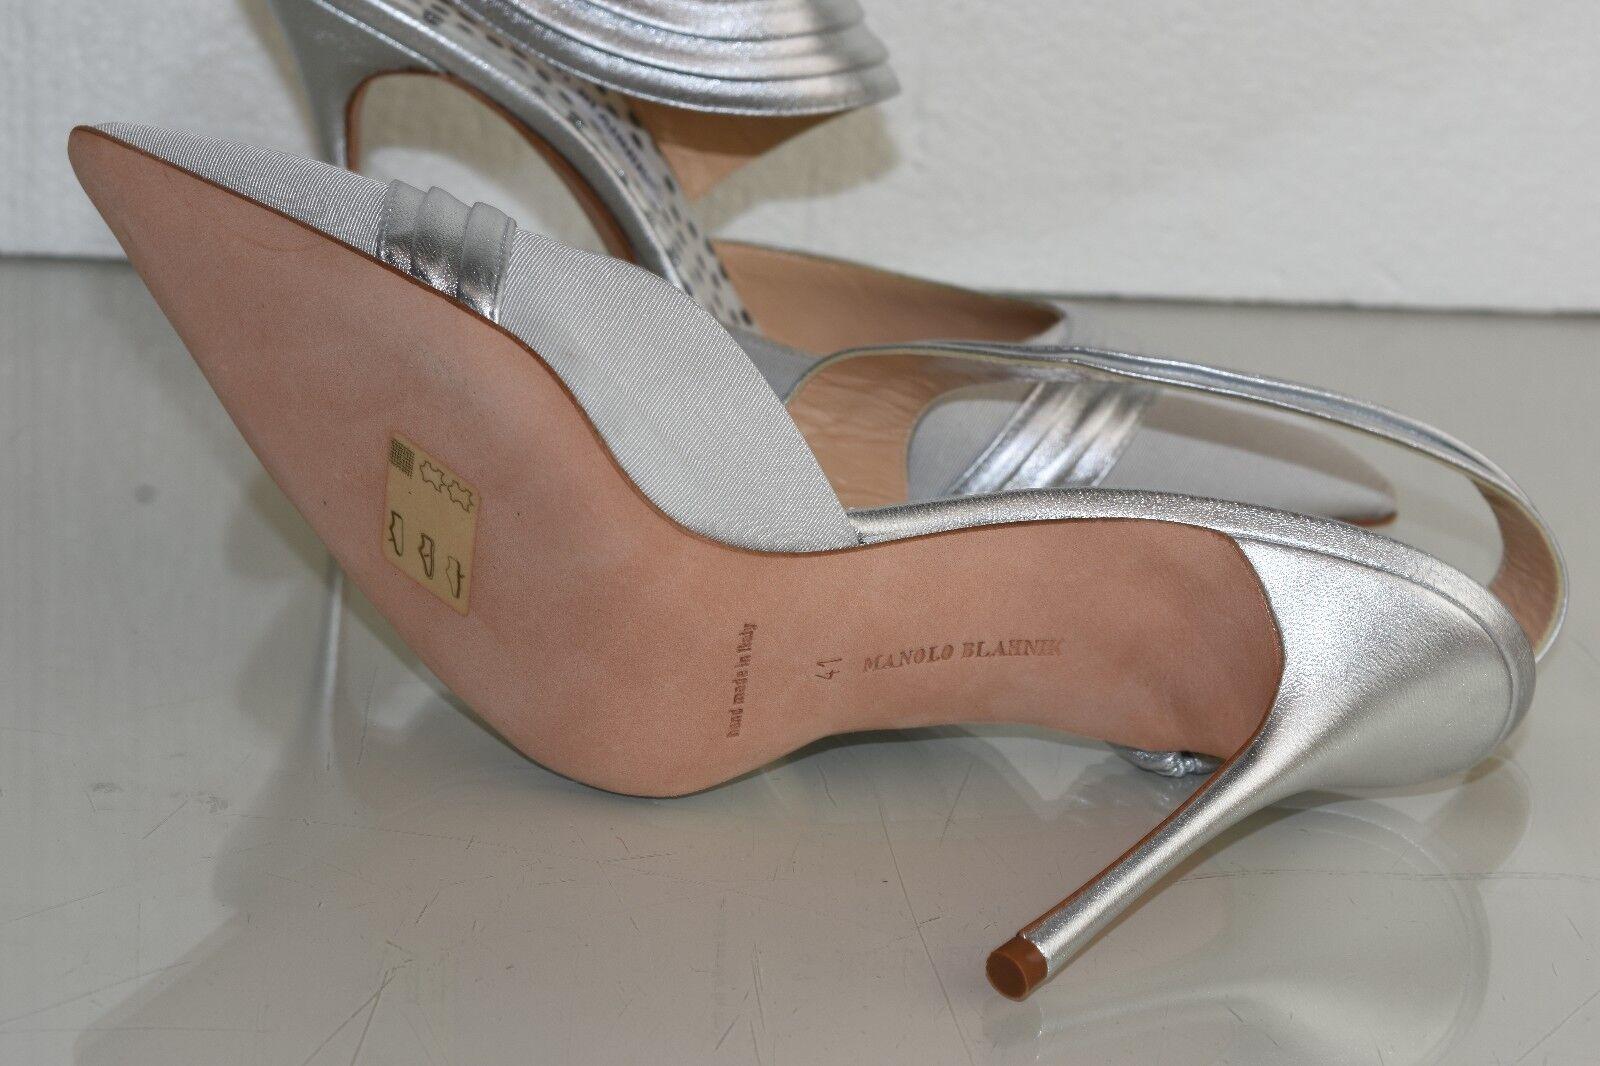 NEW Manolo Blahnik ALLA 105 Grosgrain Grosgrain Grosgrain Leather argent Pumps chaussures 41 Wedding a4e1f1